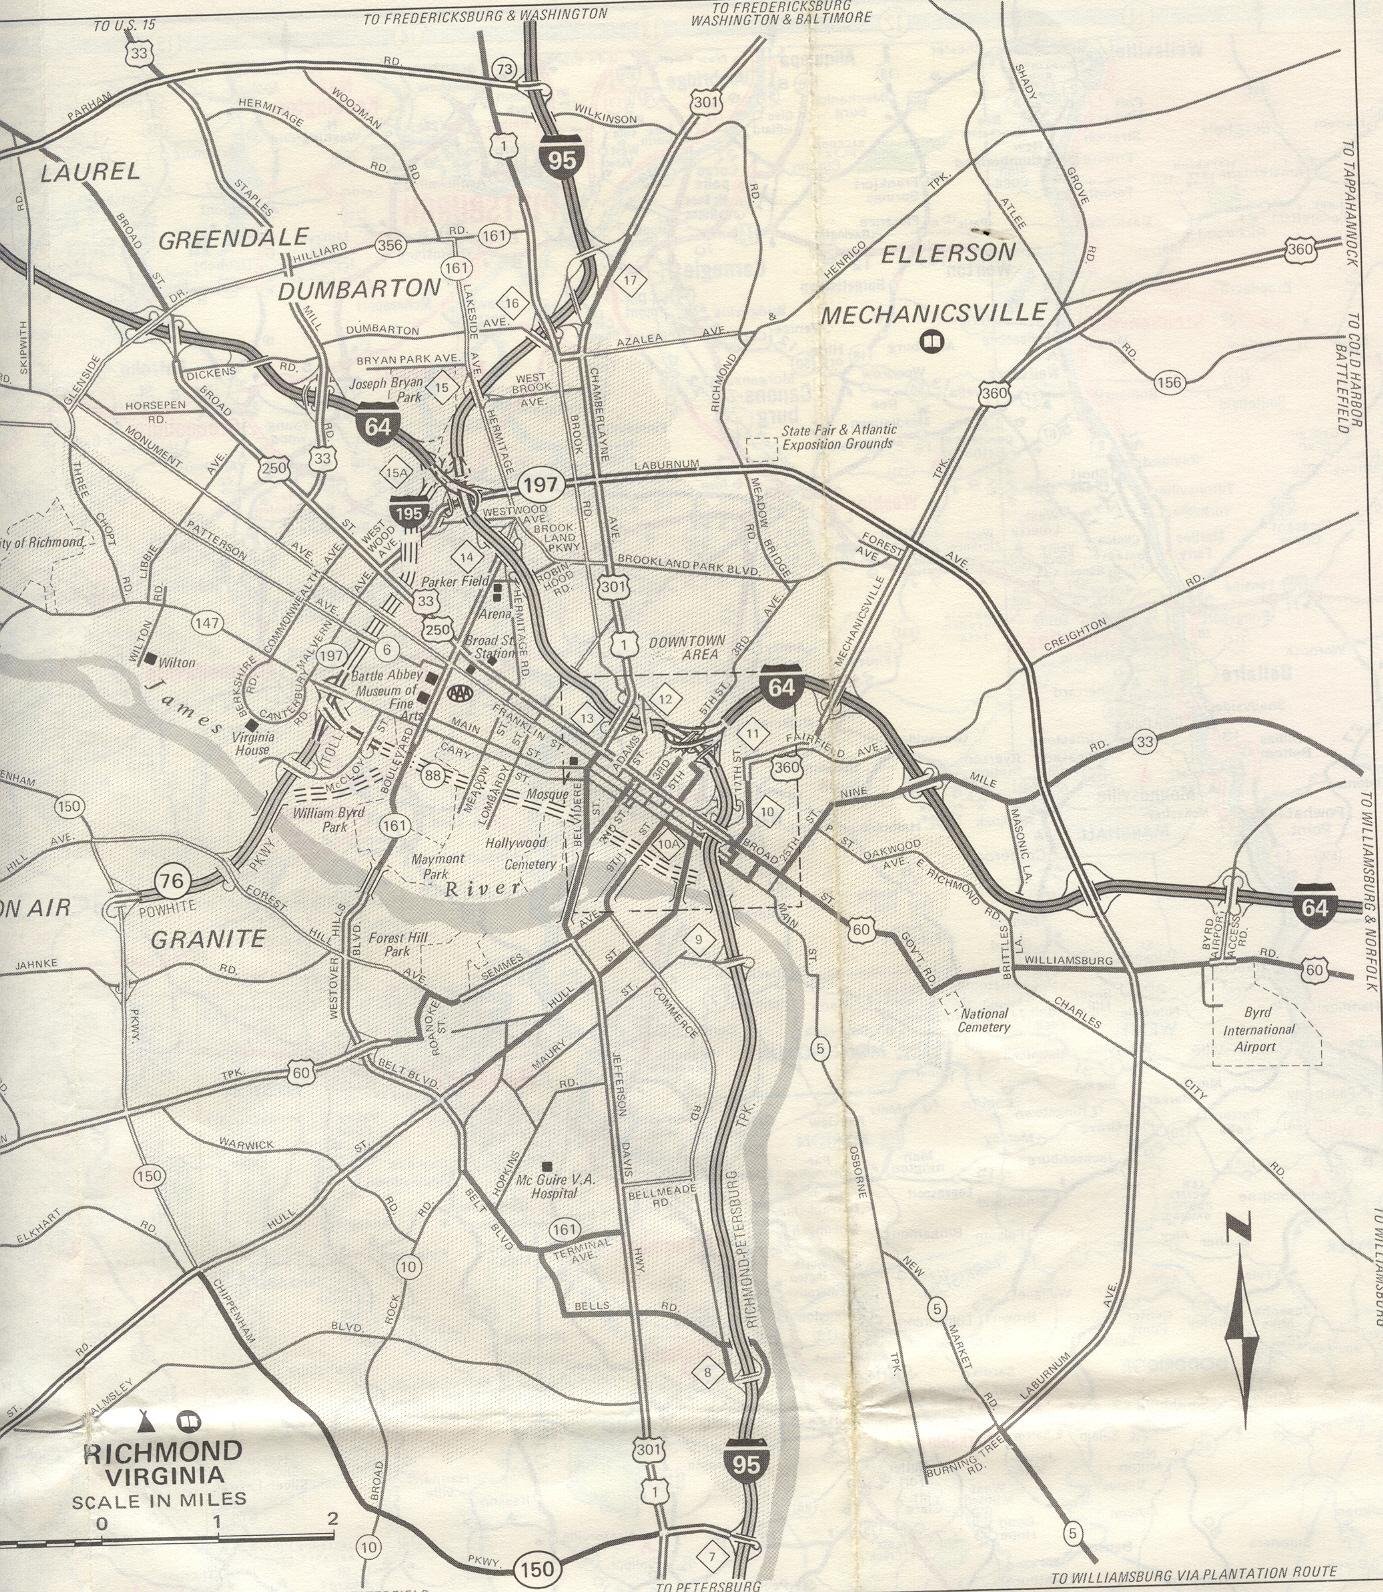 Richmond Virgina City Map  Richmond Virginia  Mappery